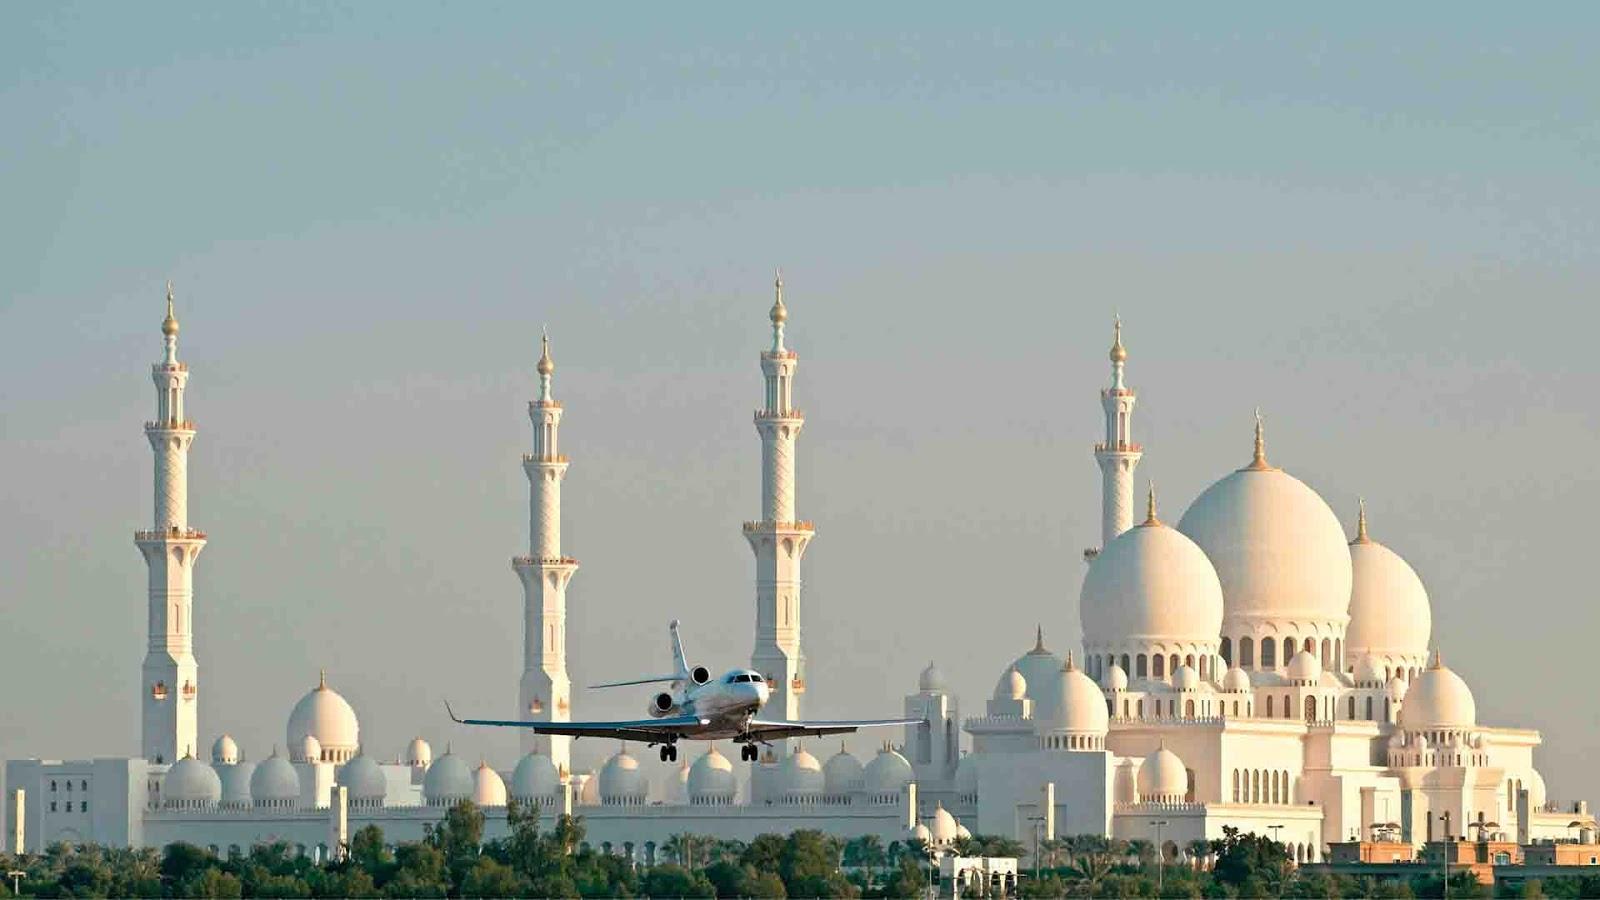 Abu Dhabi   HD Wallpapers (High Definition)   Free Background Hd Wallpaper 1920x1080 Rare